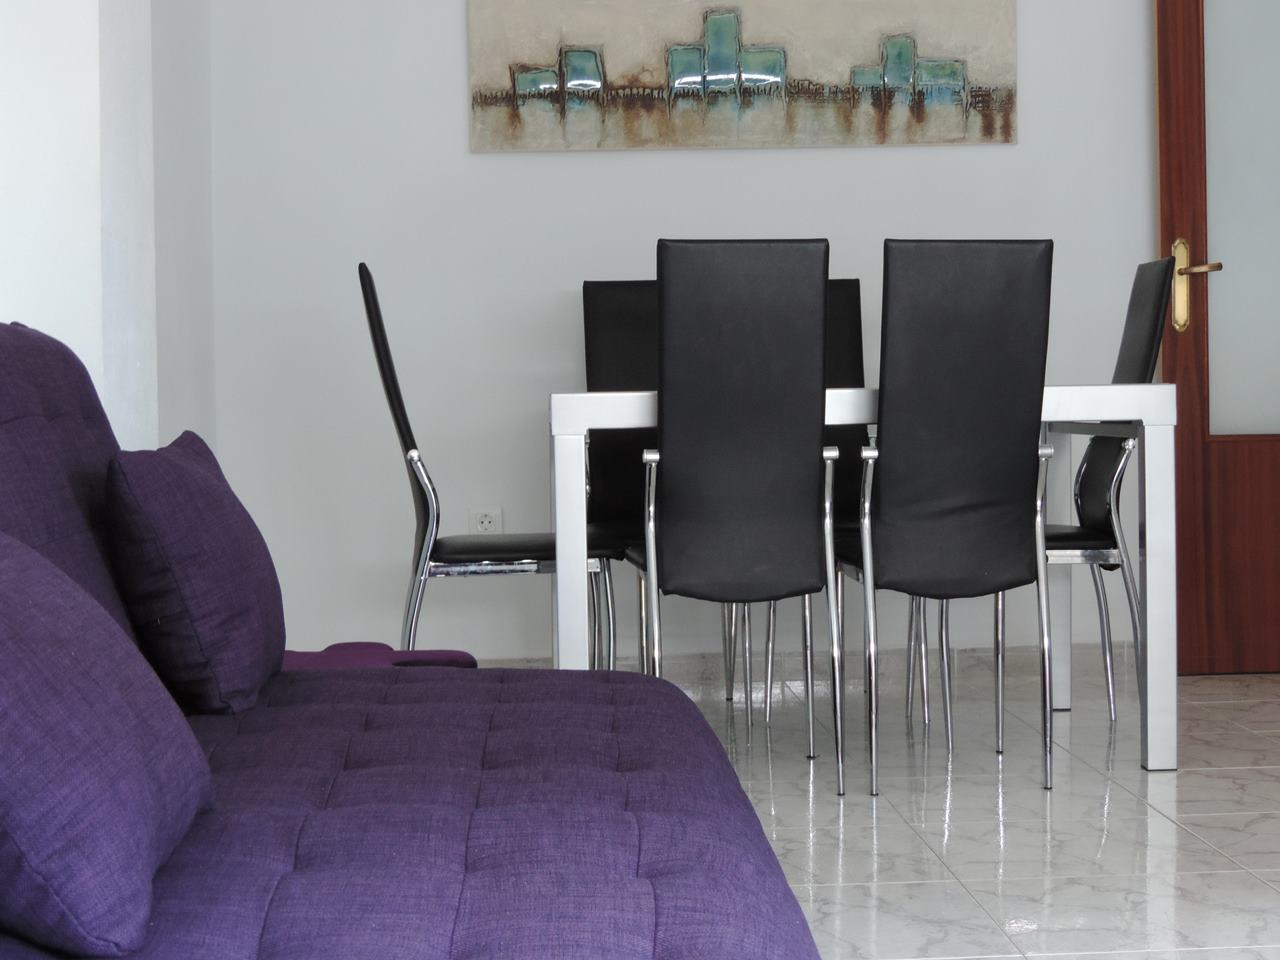 Apartamento para vacaciones Casar de Cáceres, Cáceres